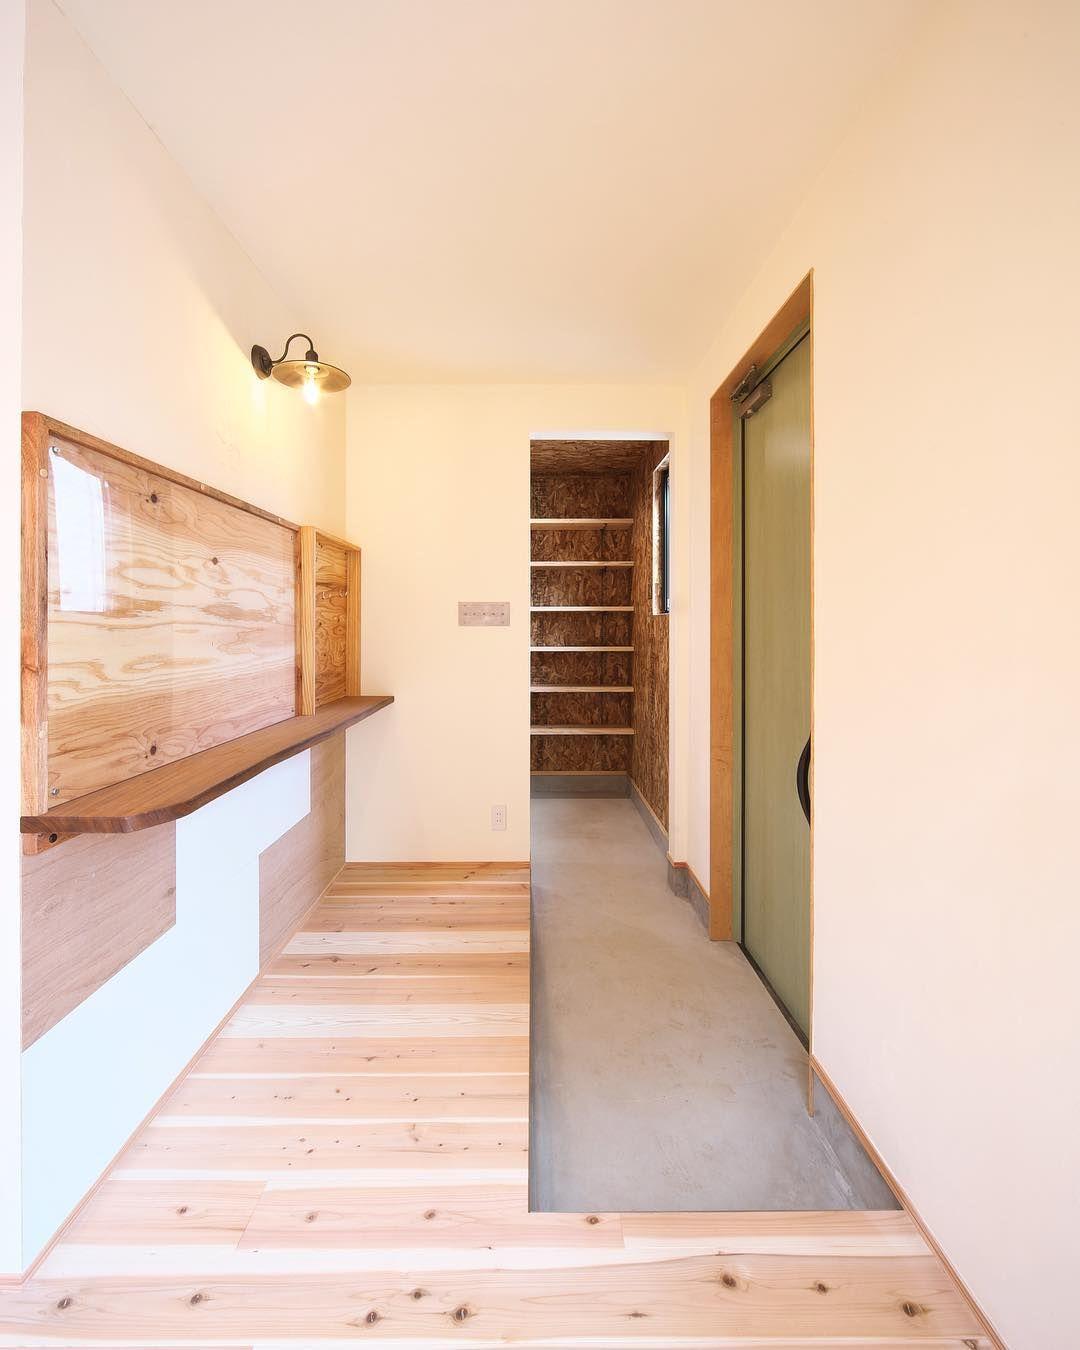 Minimaru Design On Instagram 個性的な玄関カウンターと鍵置き場